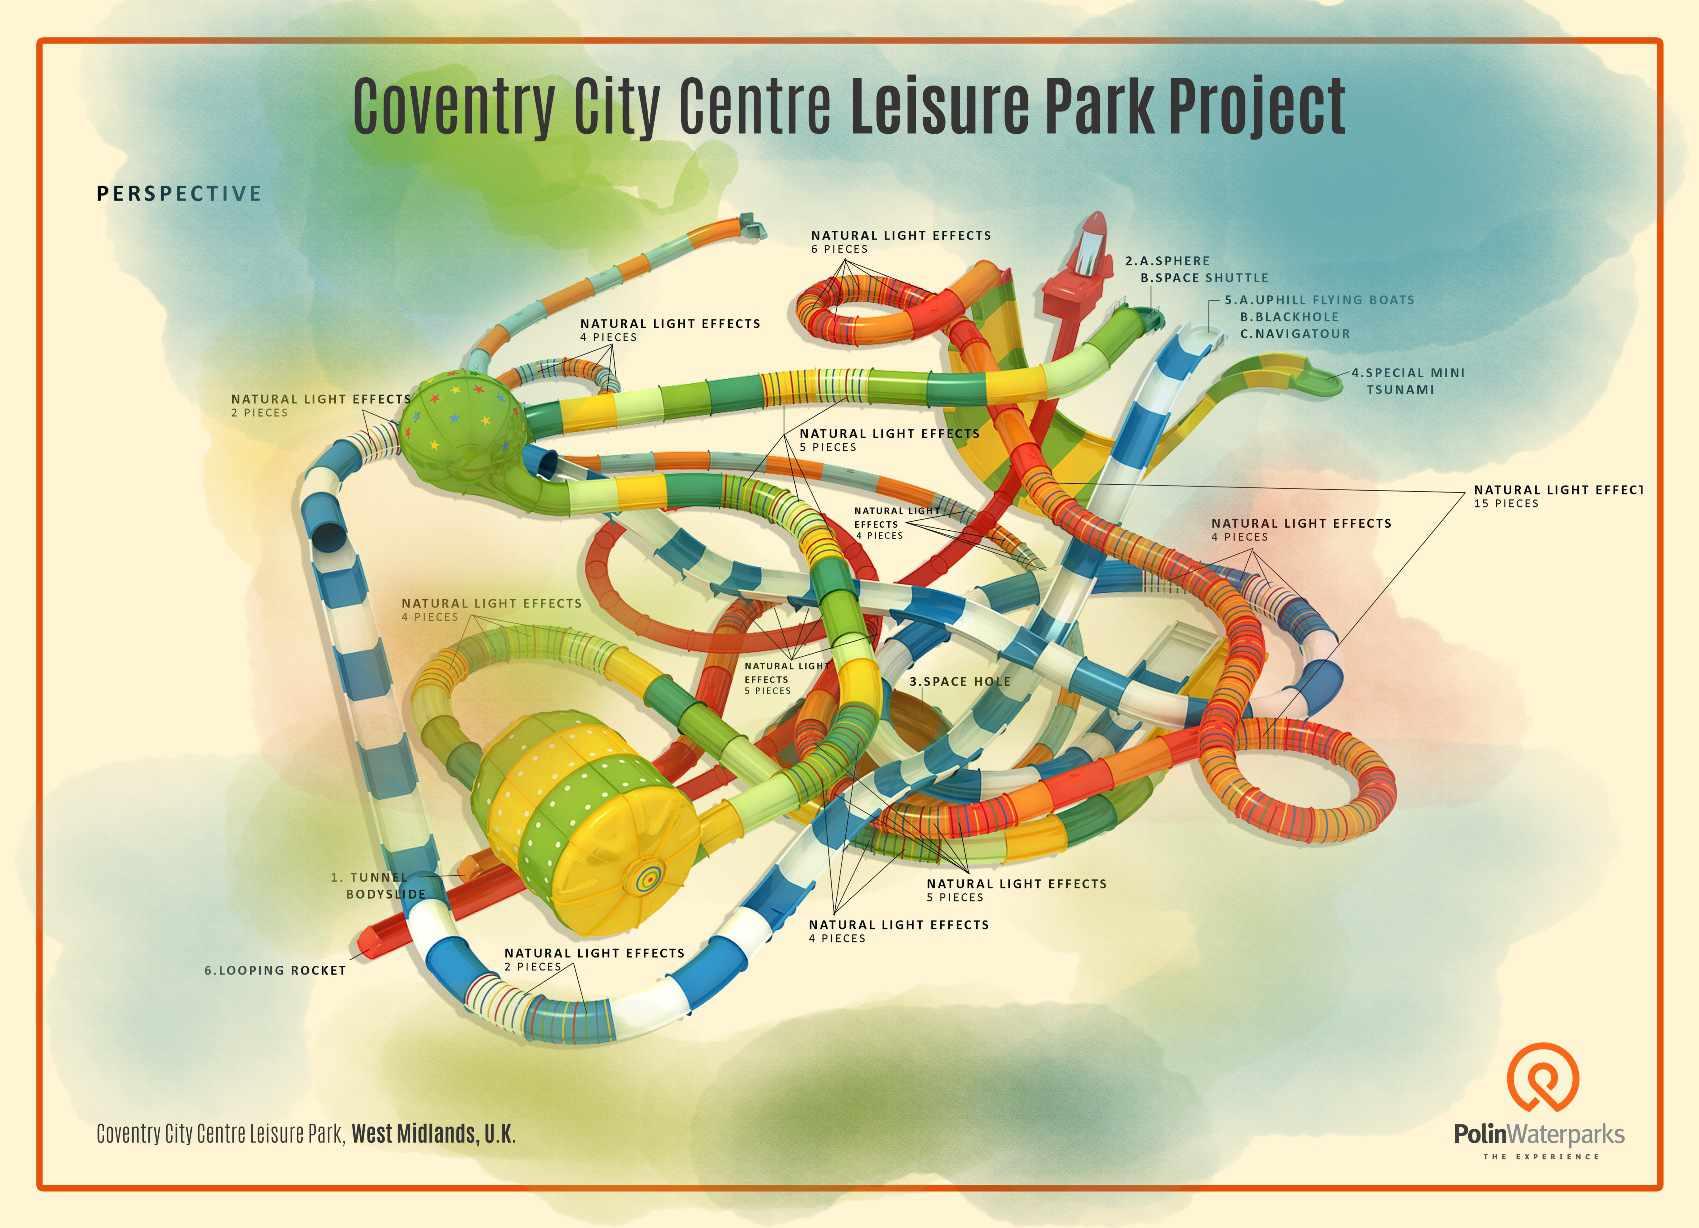 Minimum space, maximum fun: Polin creates custom waterslides for Coventry's compact new leisure centre